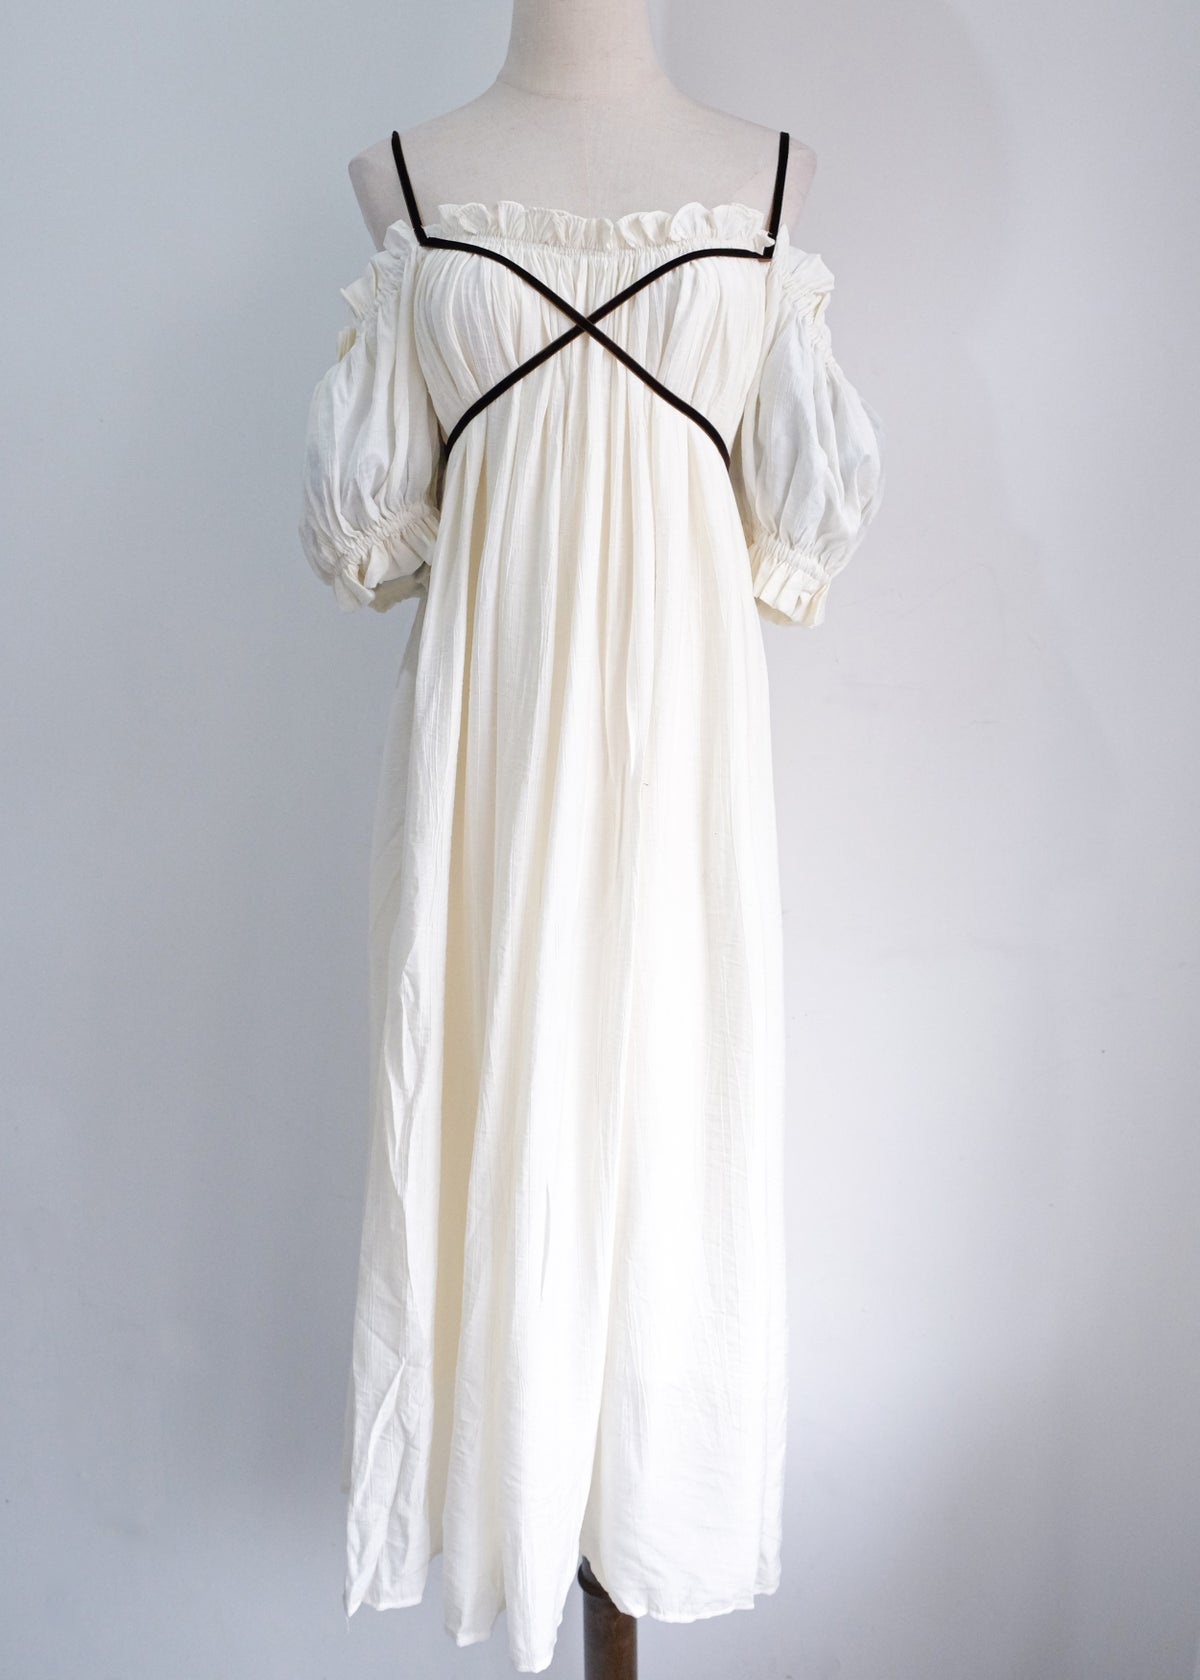 Image of SAMPLE SALE - Unreleased Dress 23